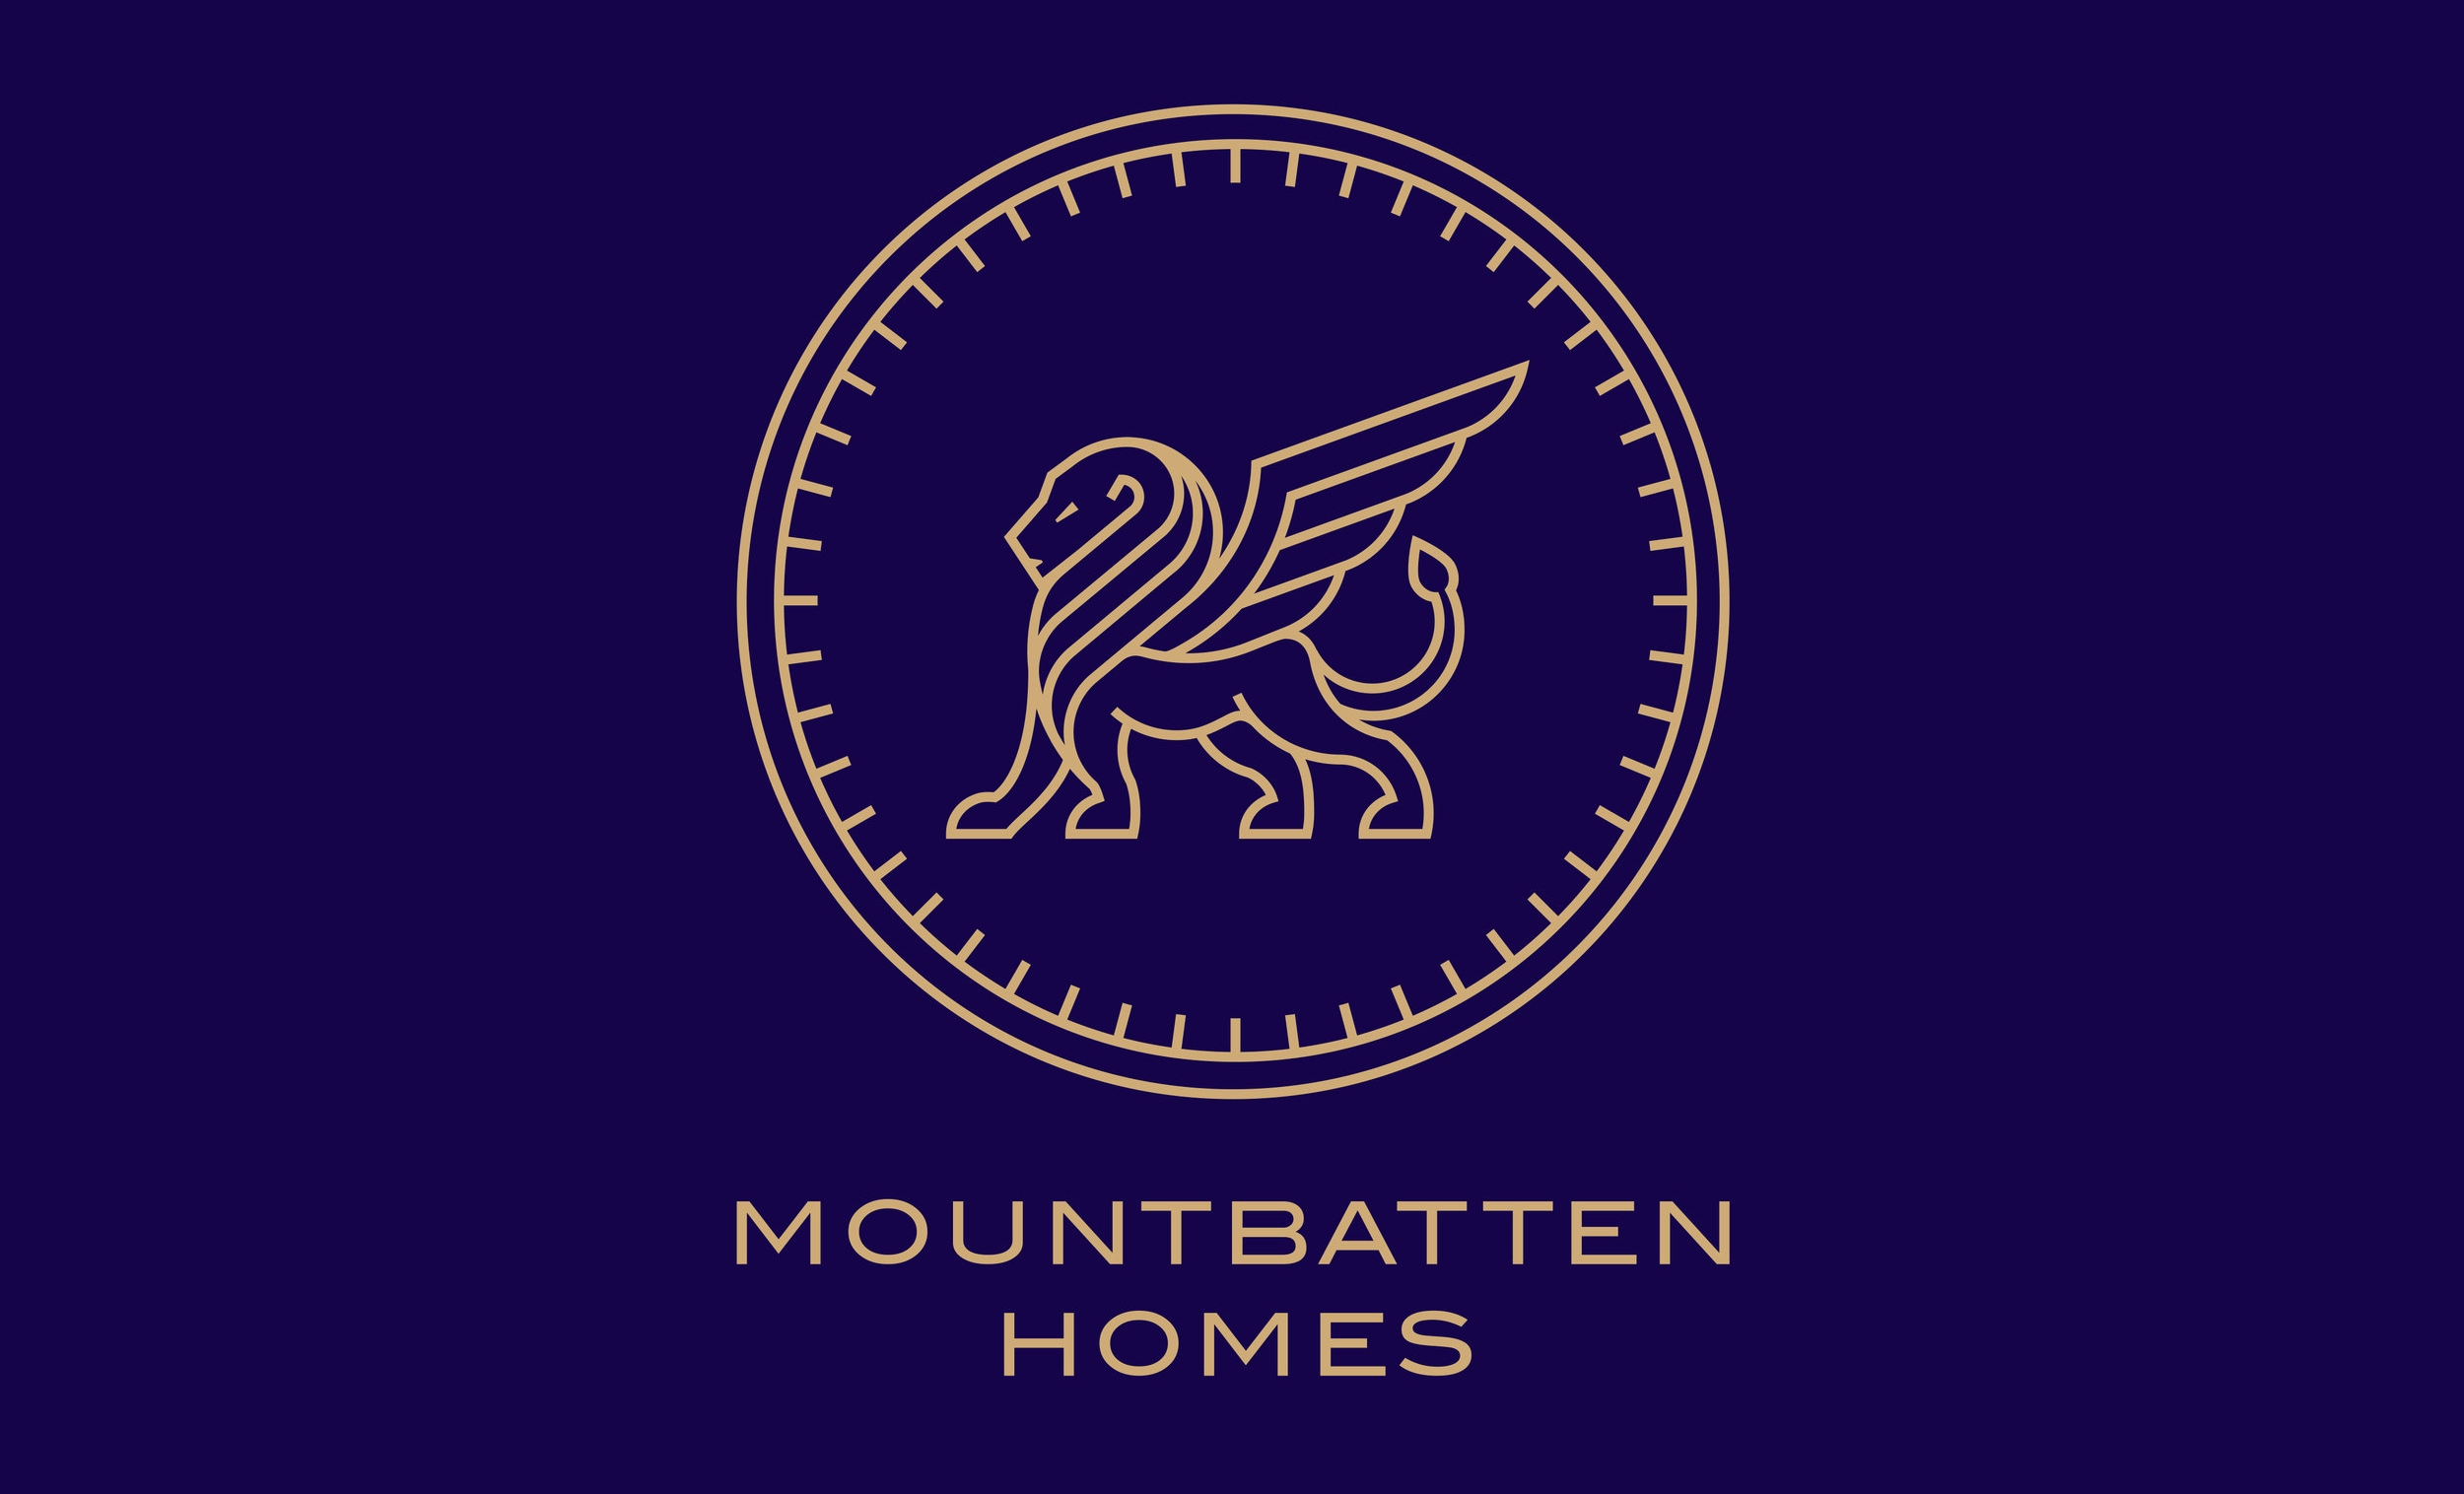 Mountbatten Homes.jpg